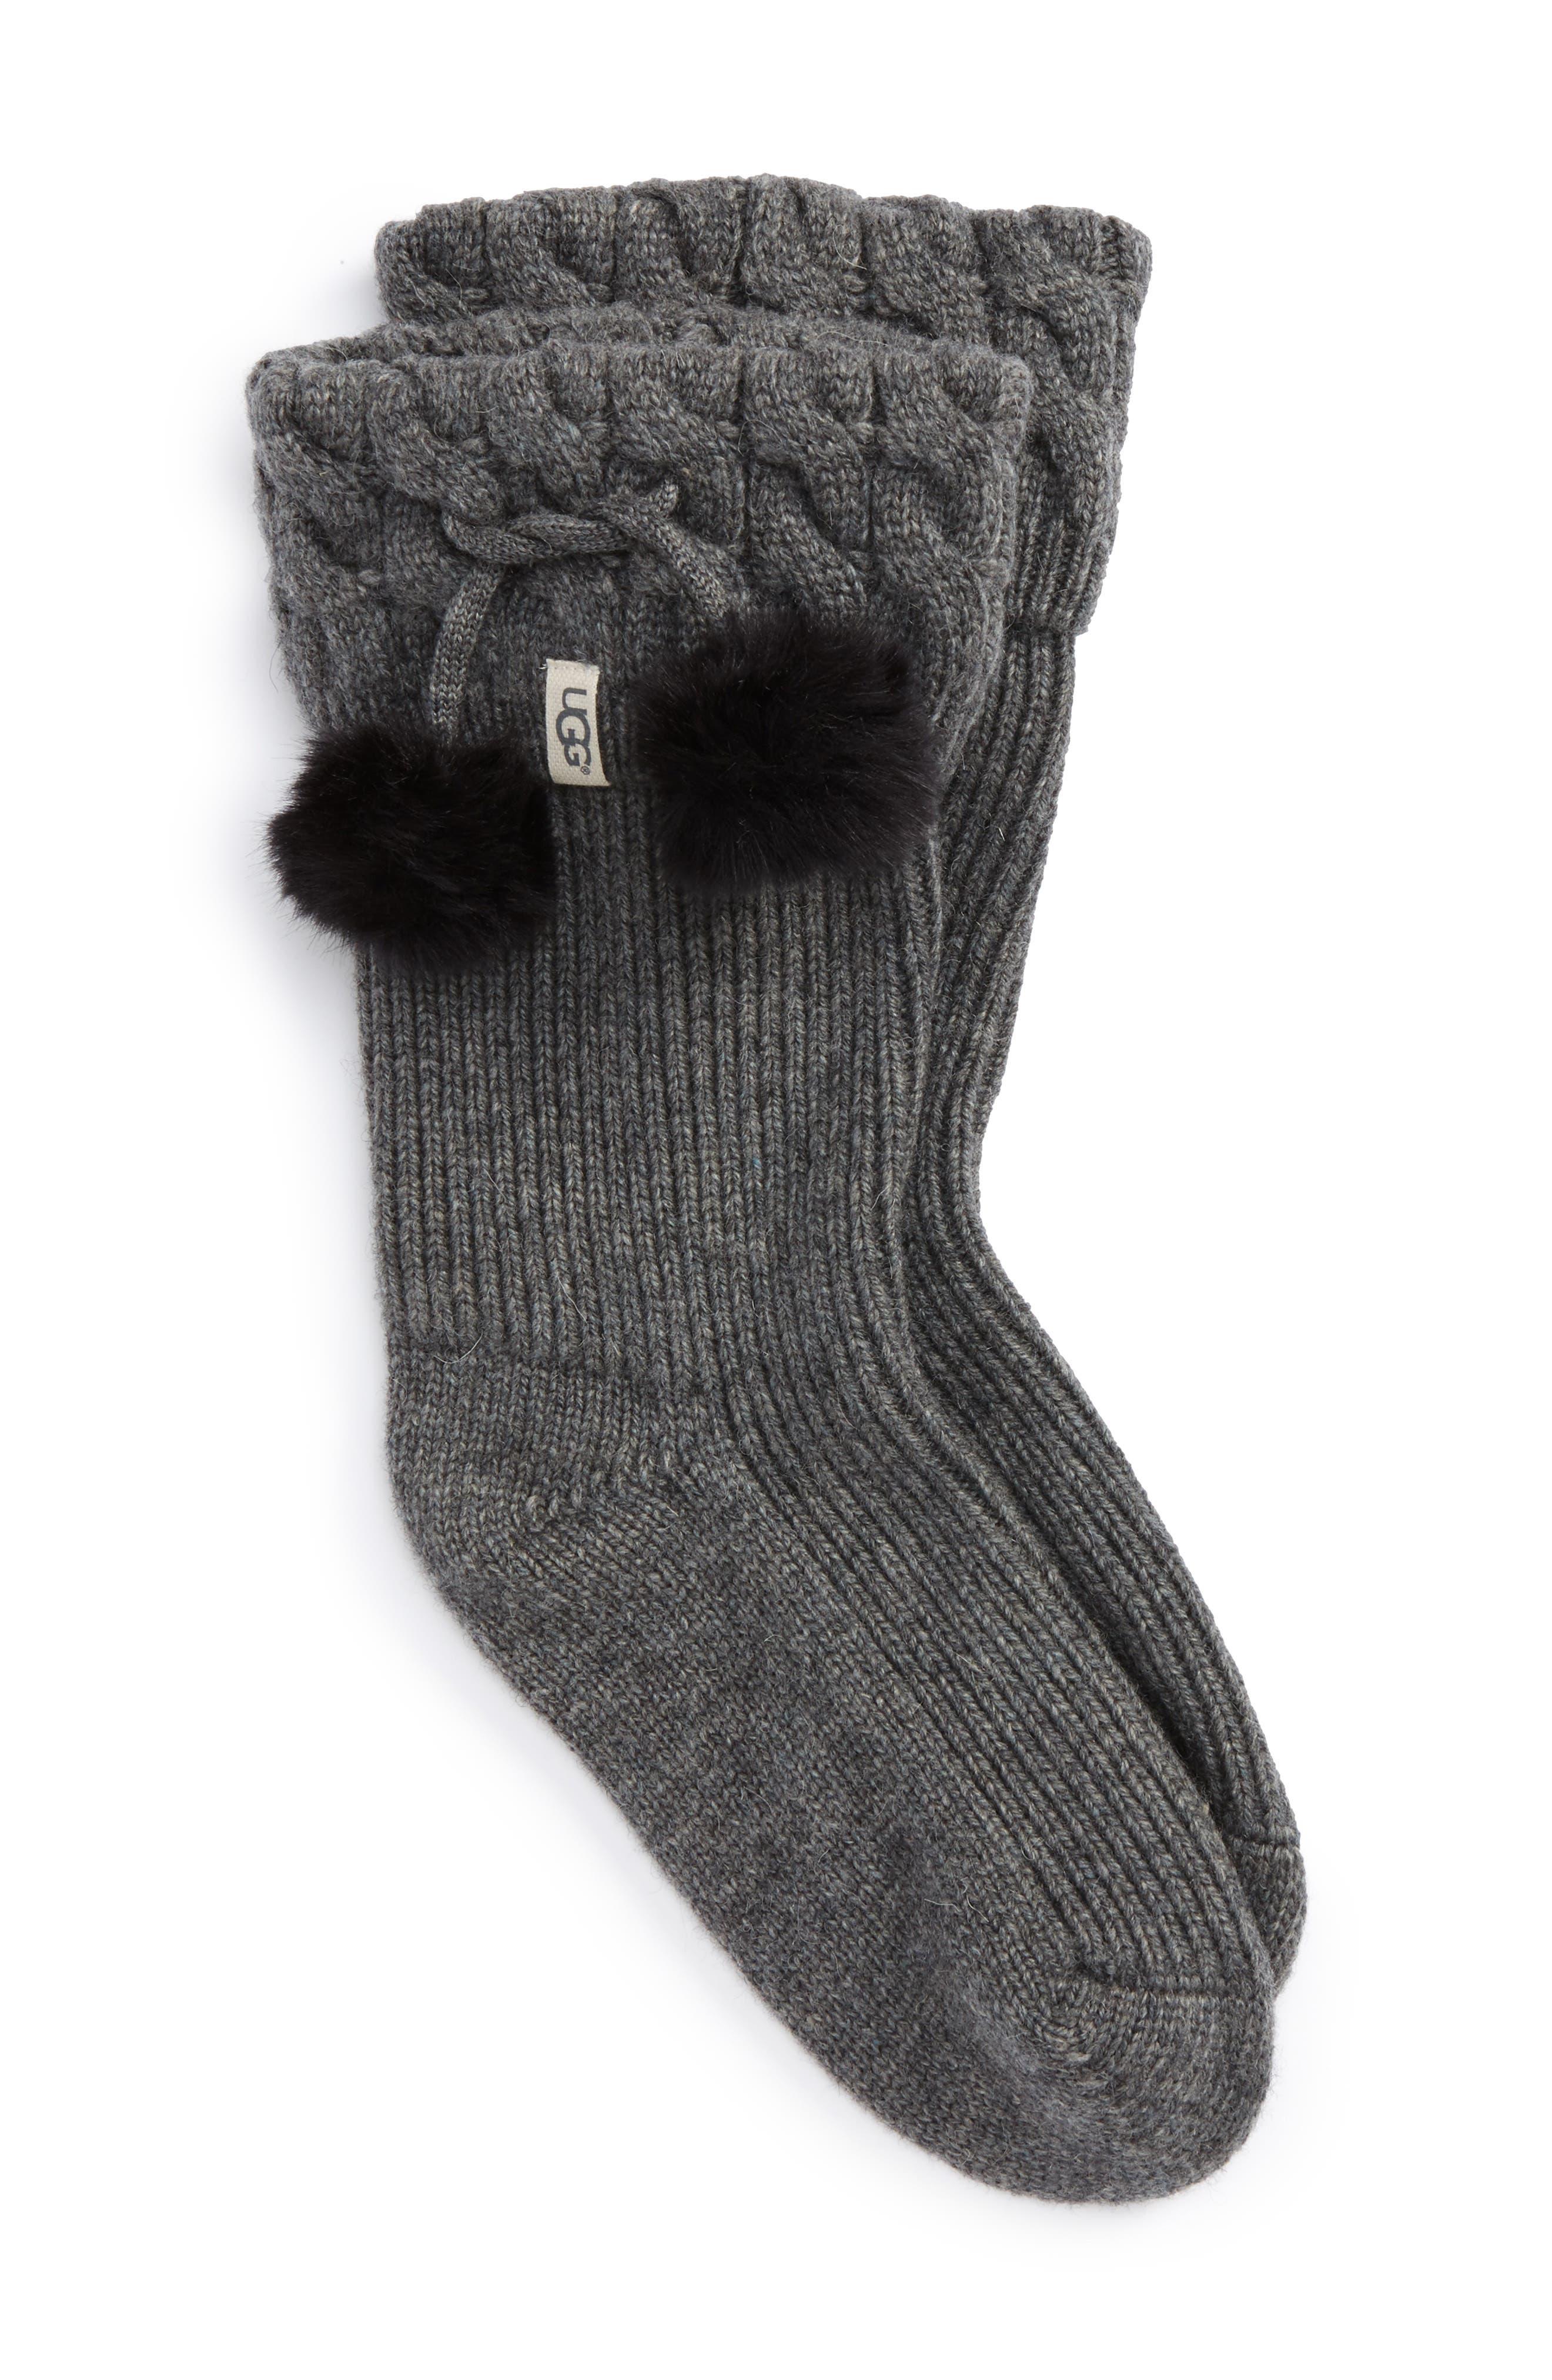 Main Image - UGG® UGGpure™ Pompom Short Rain Boot Sock (Women)